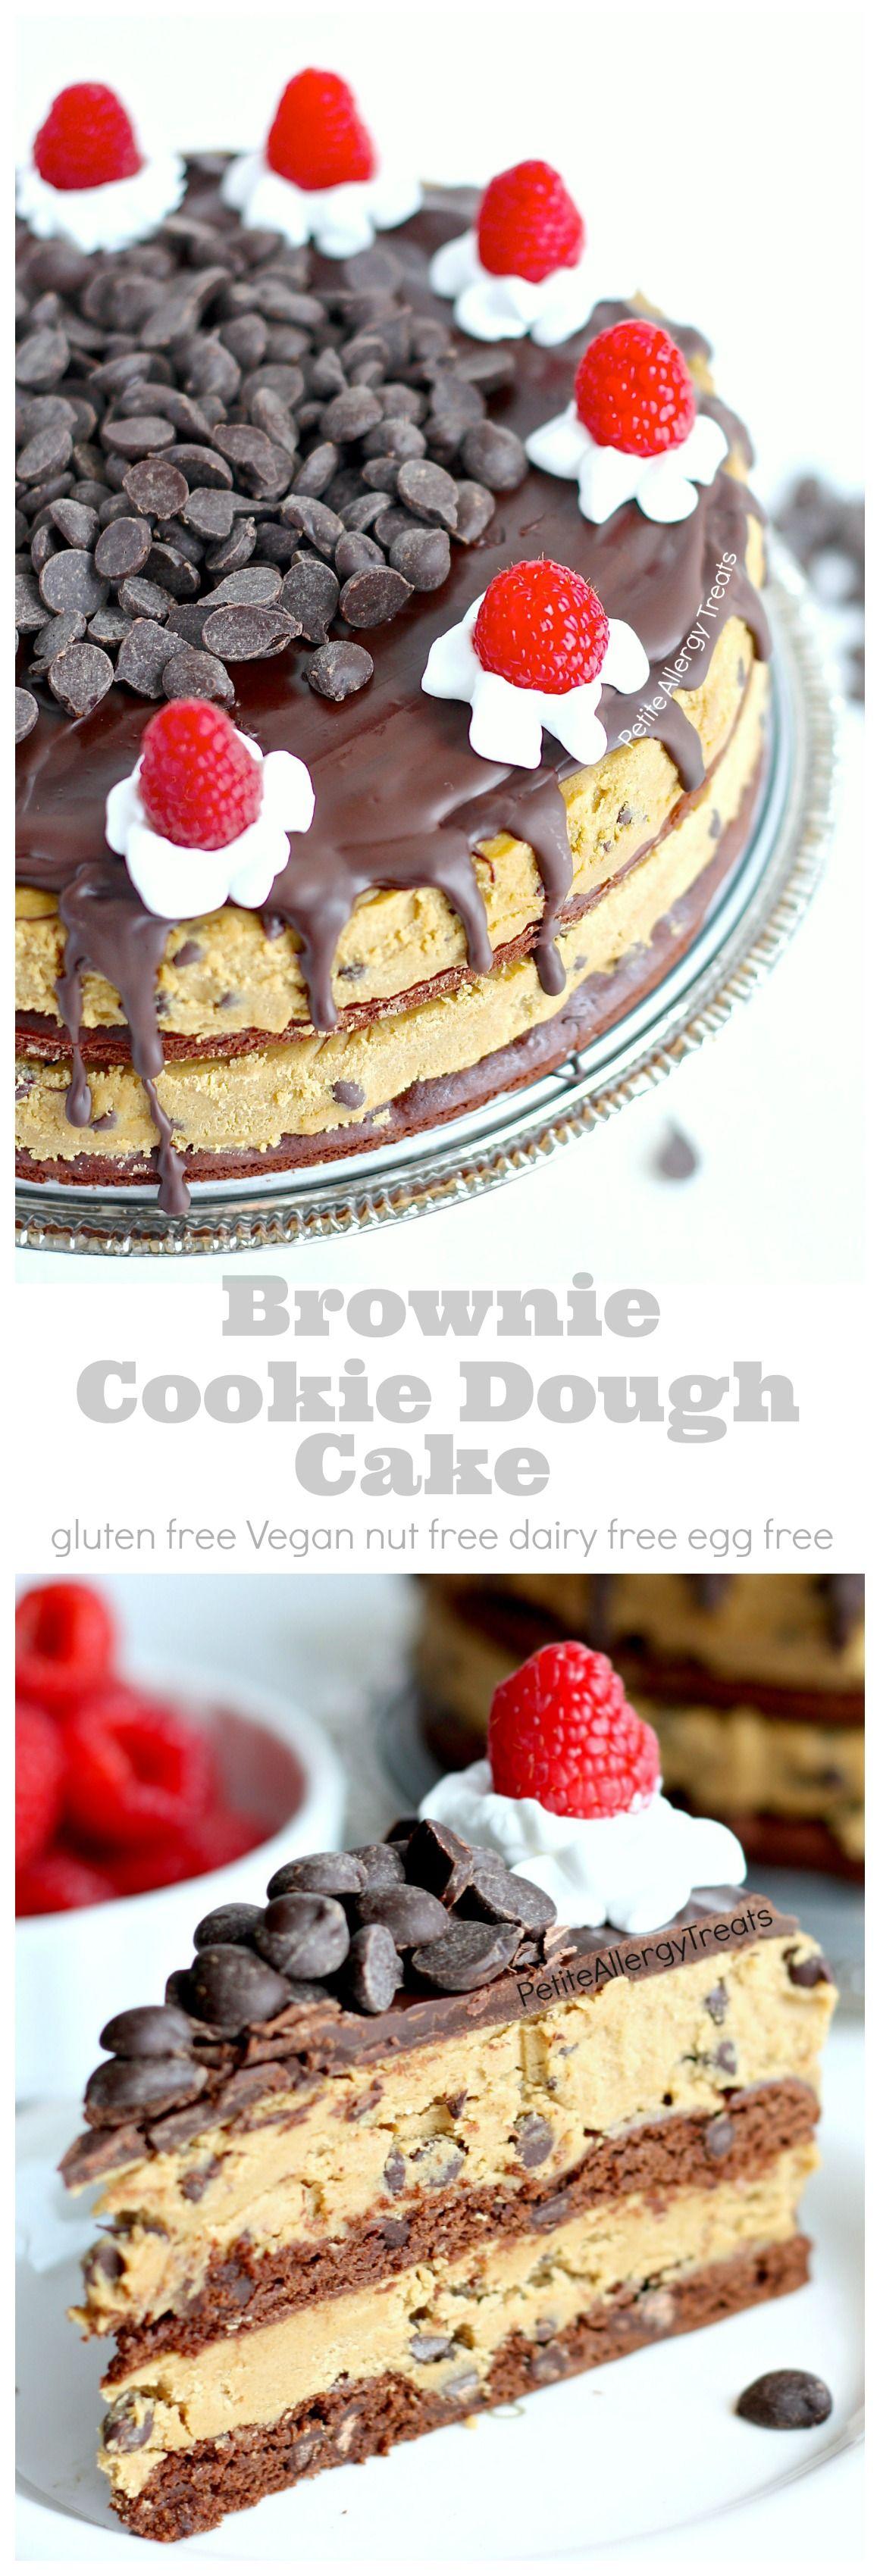 Gluten Free Cookie Dough Brownie Cake Vegan Recipe Gluten